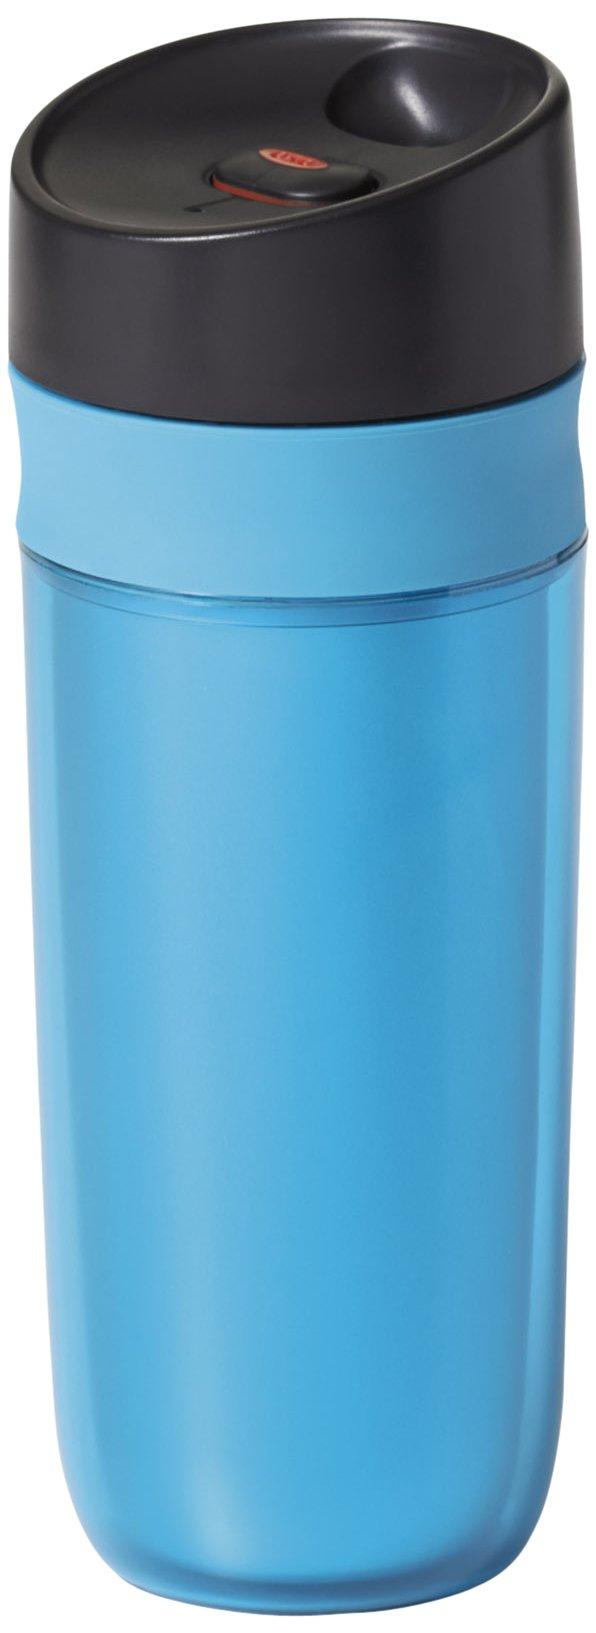 OXO Good Grips Double Wall Travel Mug, Blue- 15 ounce